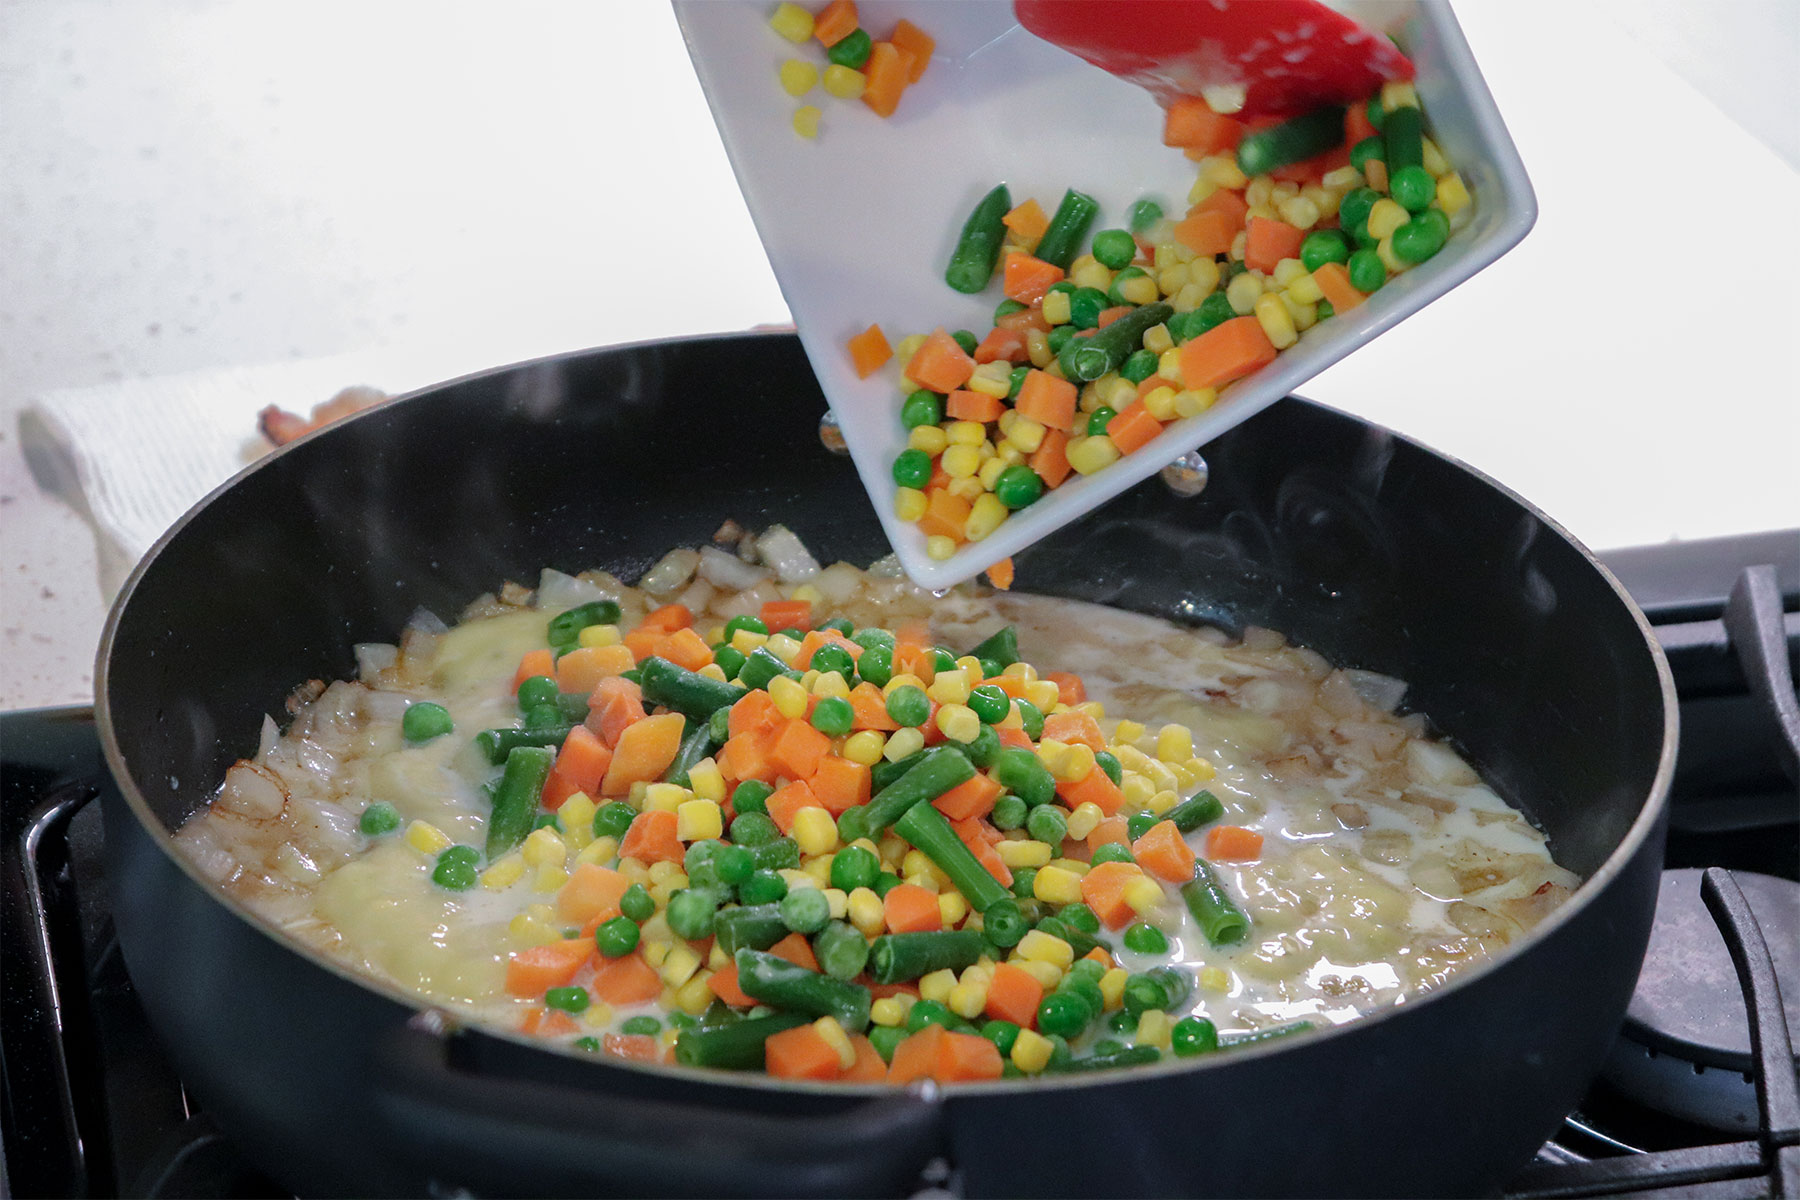 Adding veggies to cast iron skillet